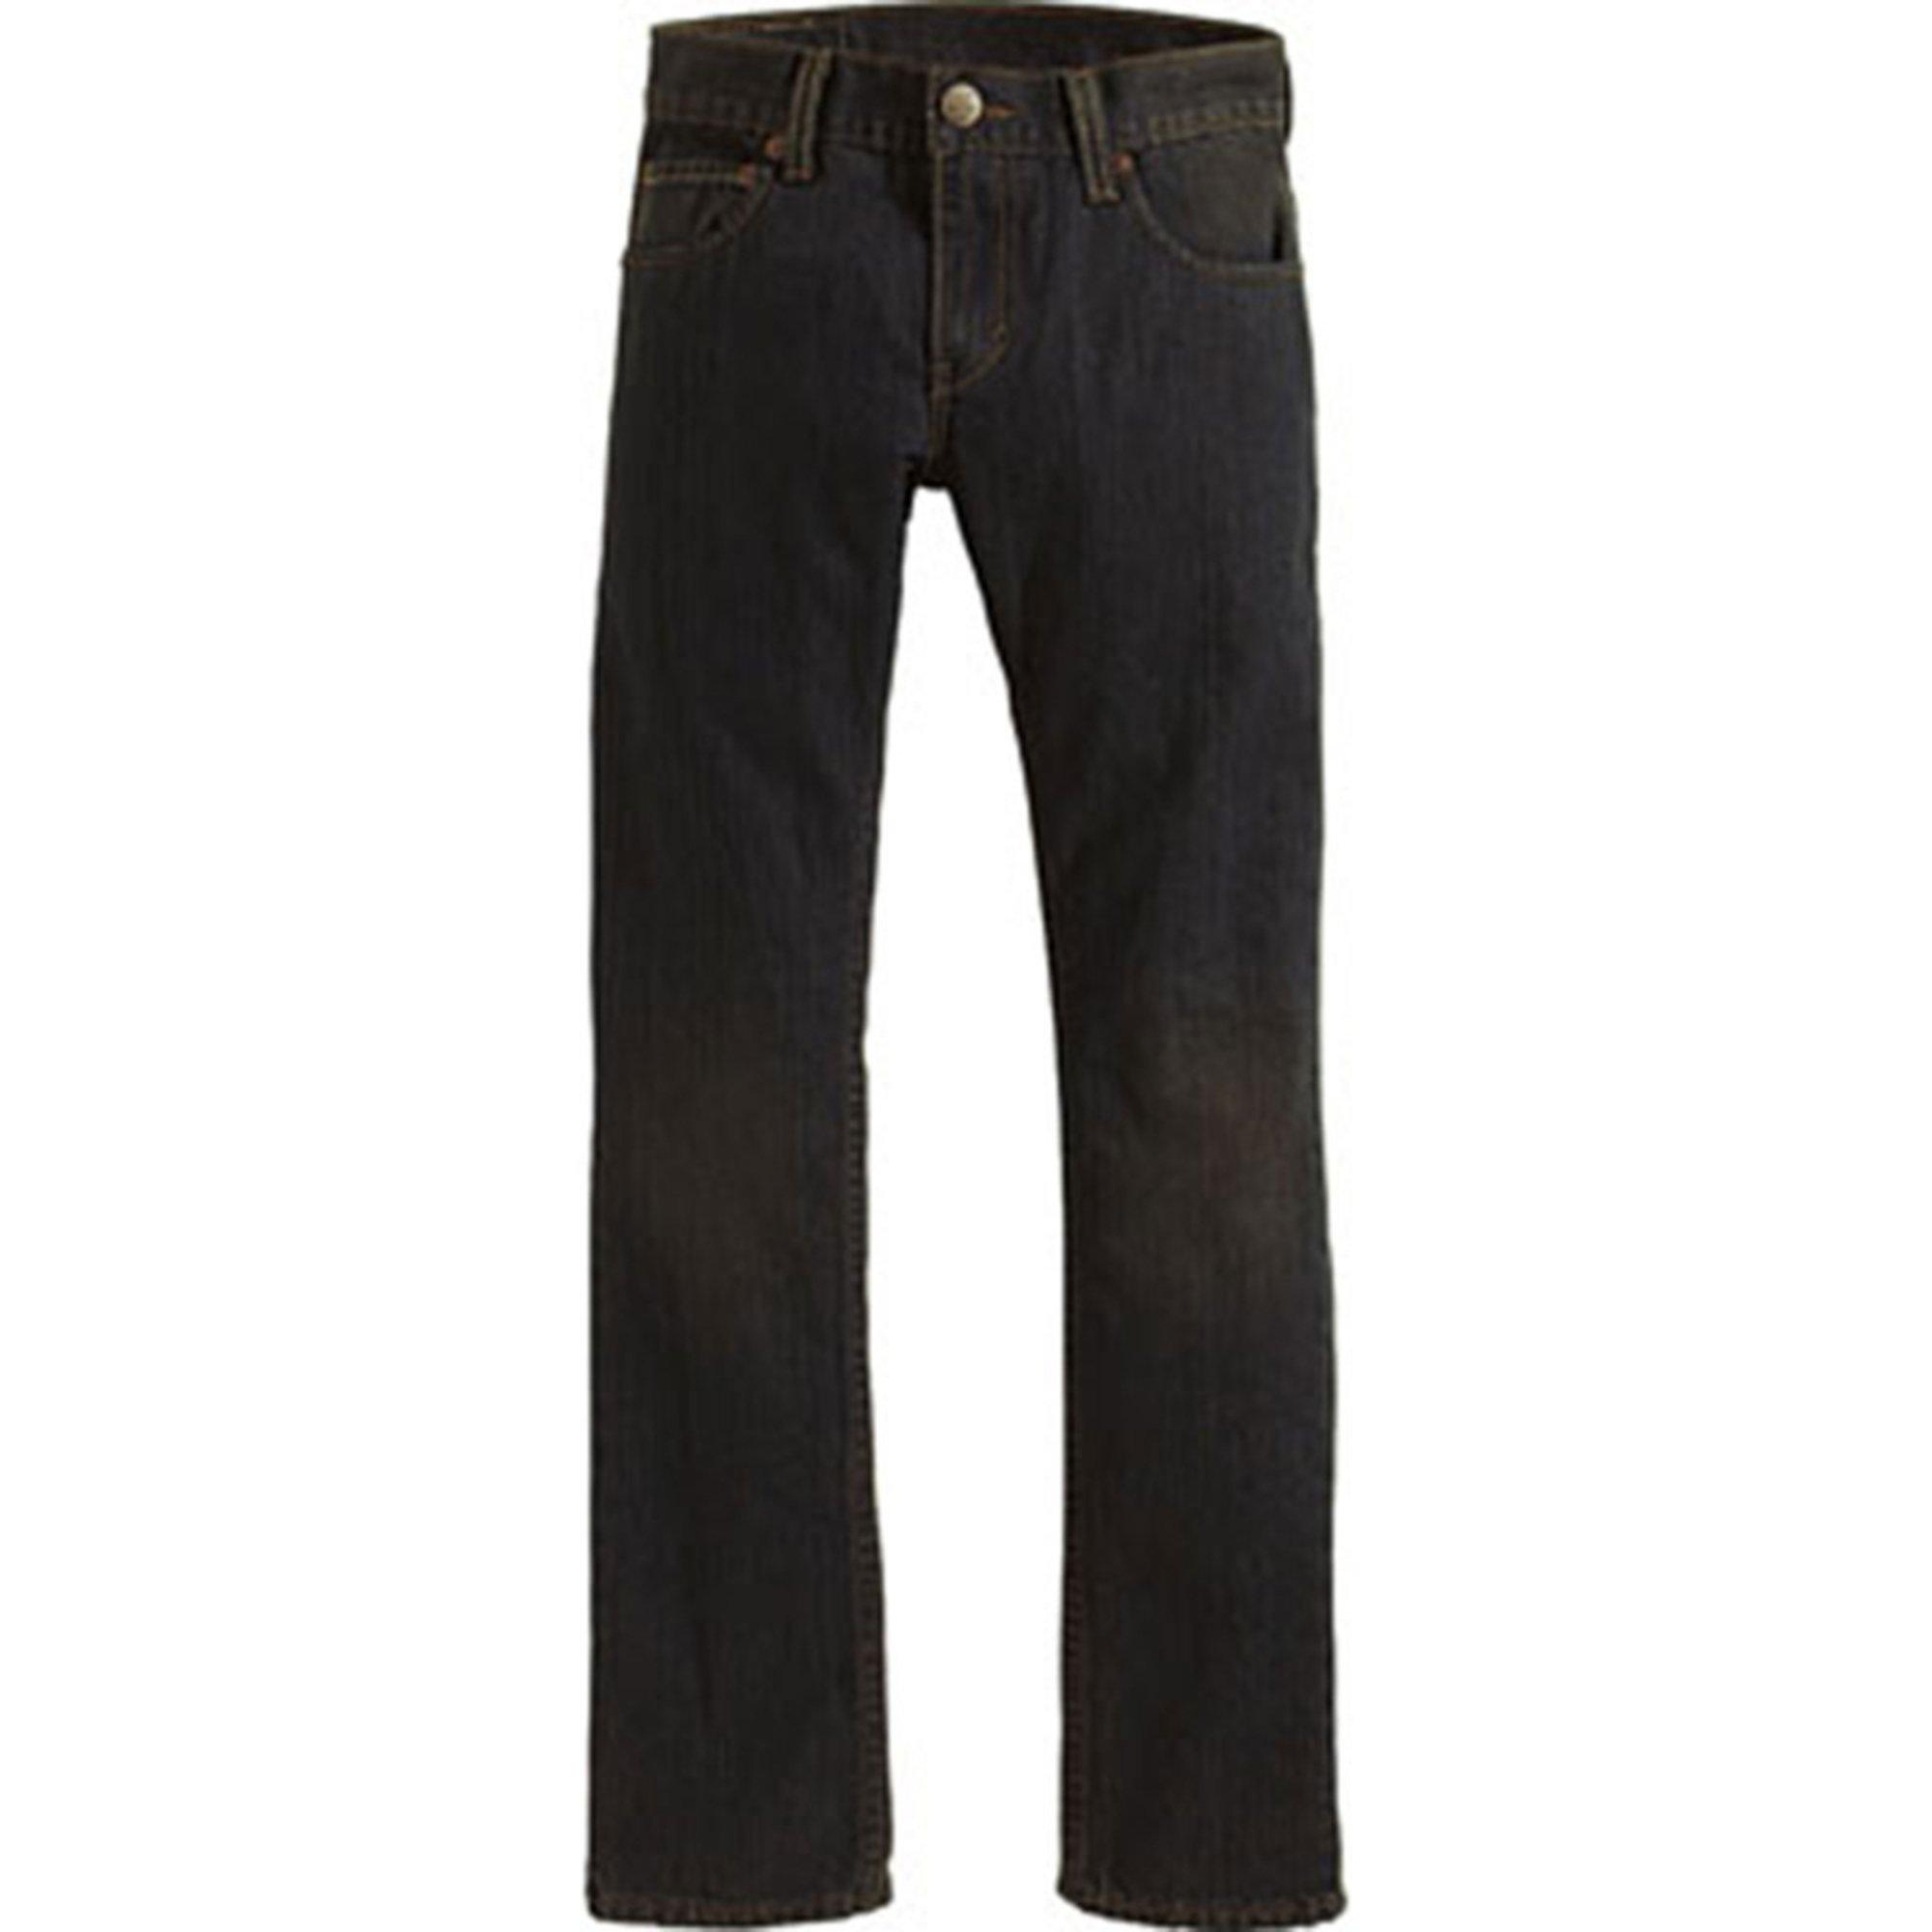 2b14d5b4 Boys' Jeans | Shop Your Navy Exchange - Official Site